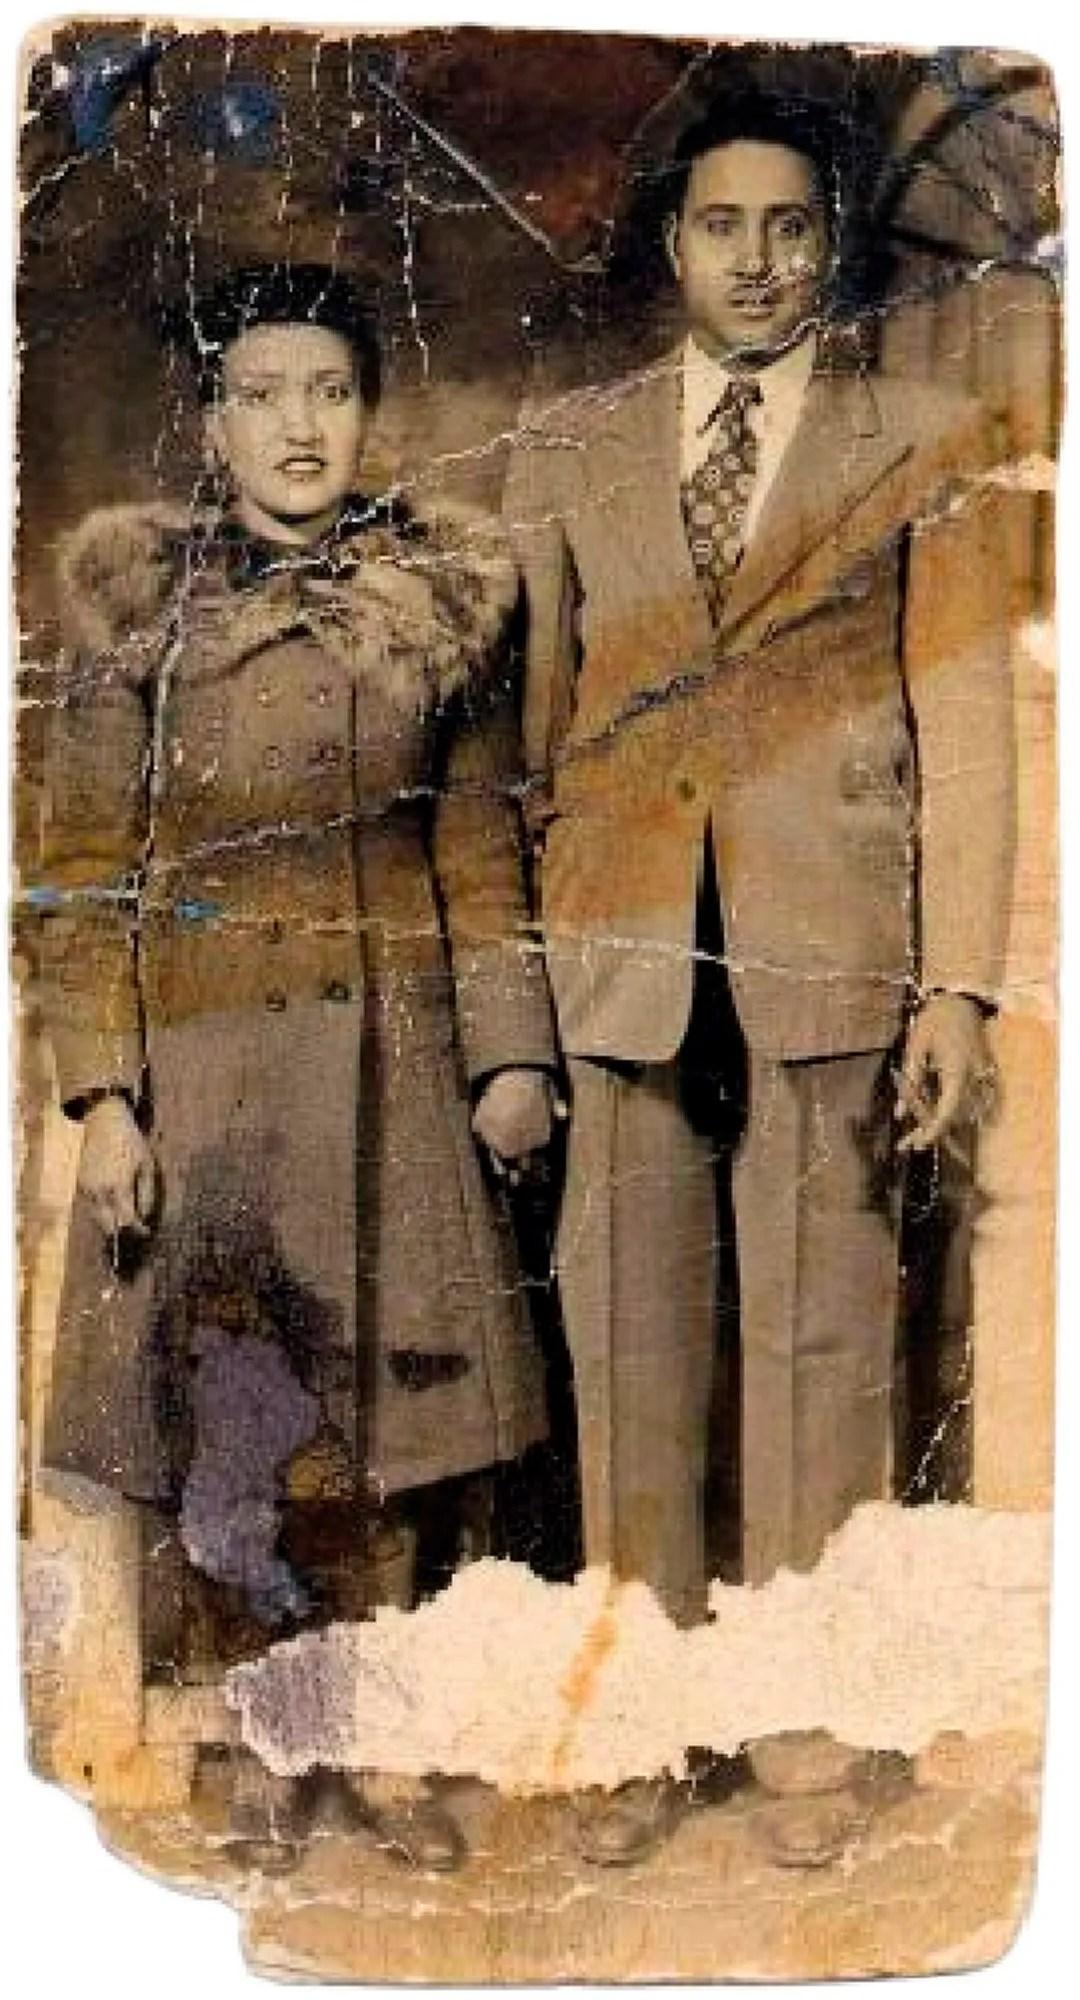 , WHO honours Henrietta Lacks, whose cells changed medicine, Nzuchi Times National News